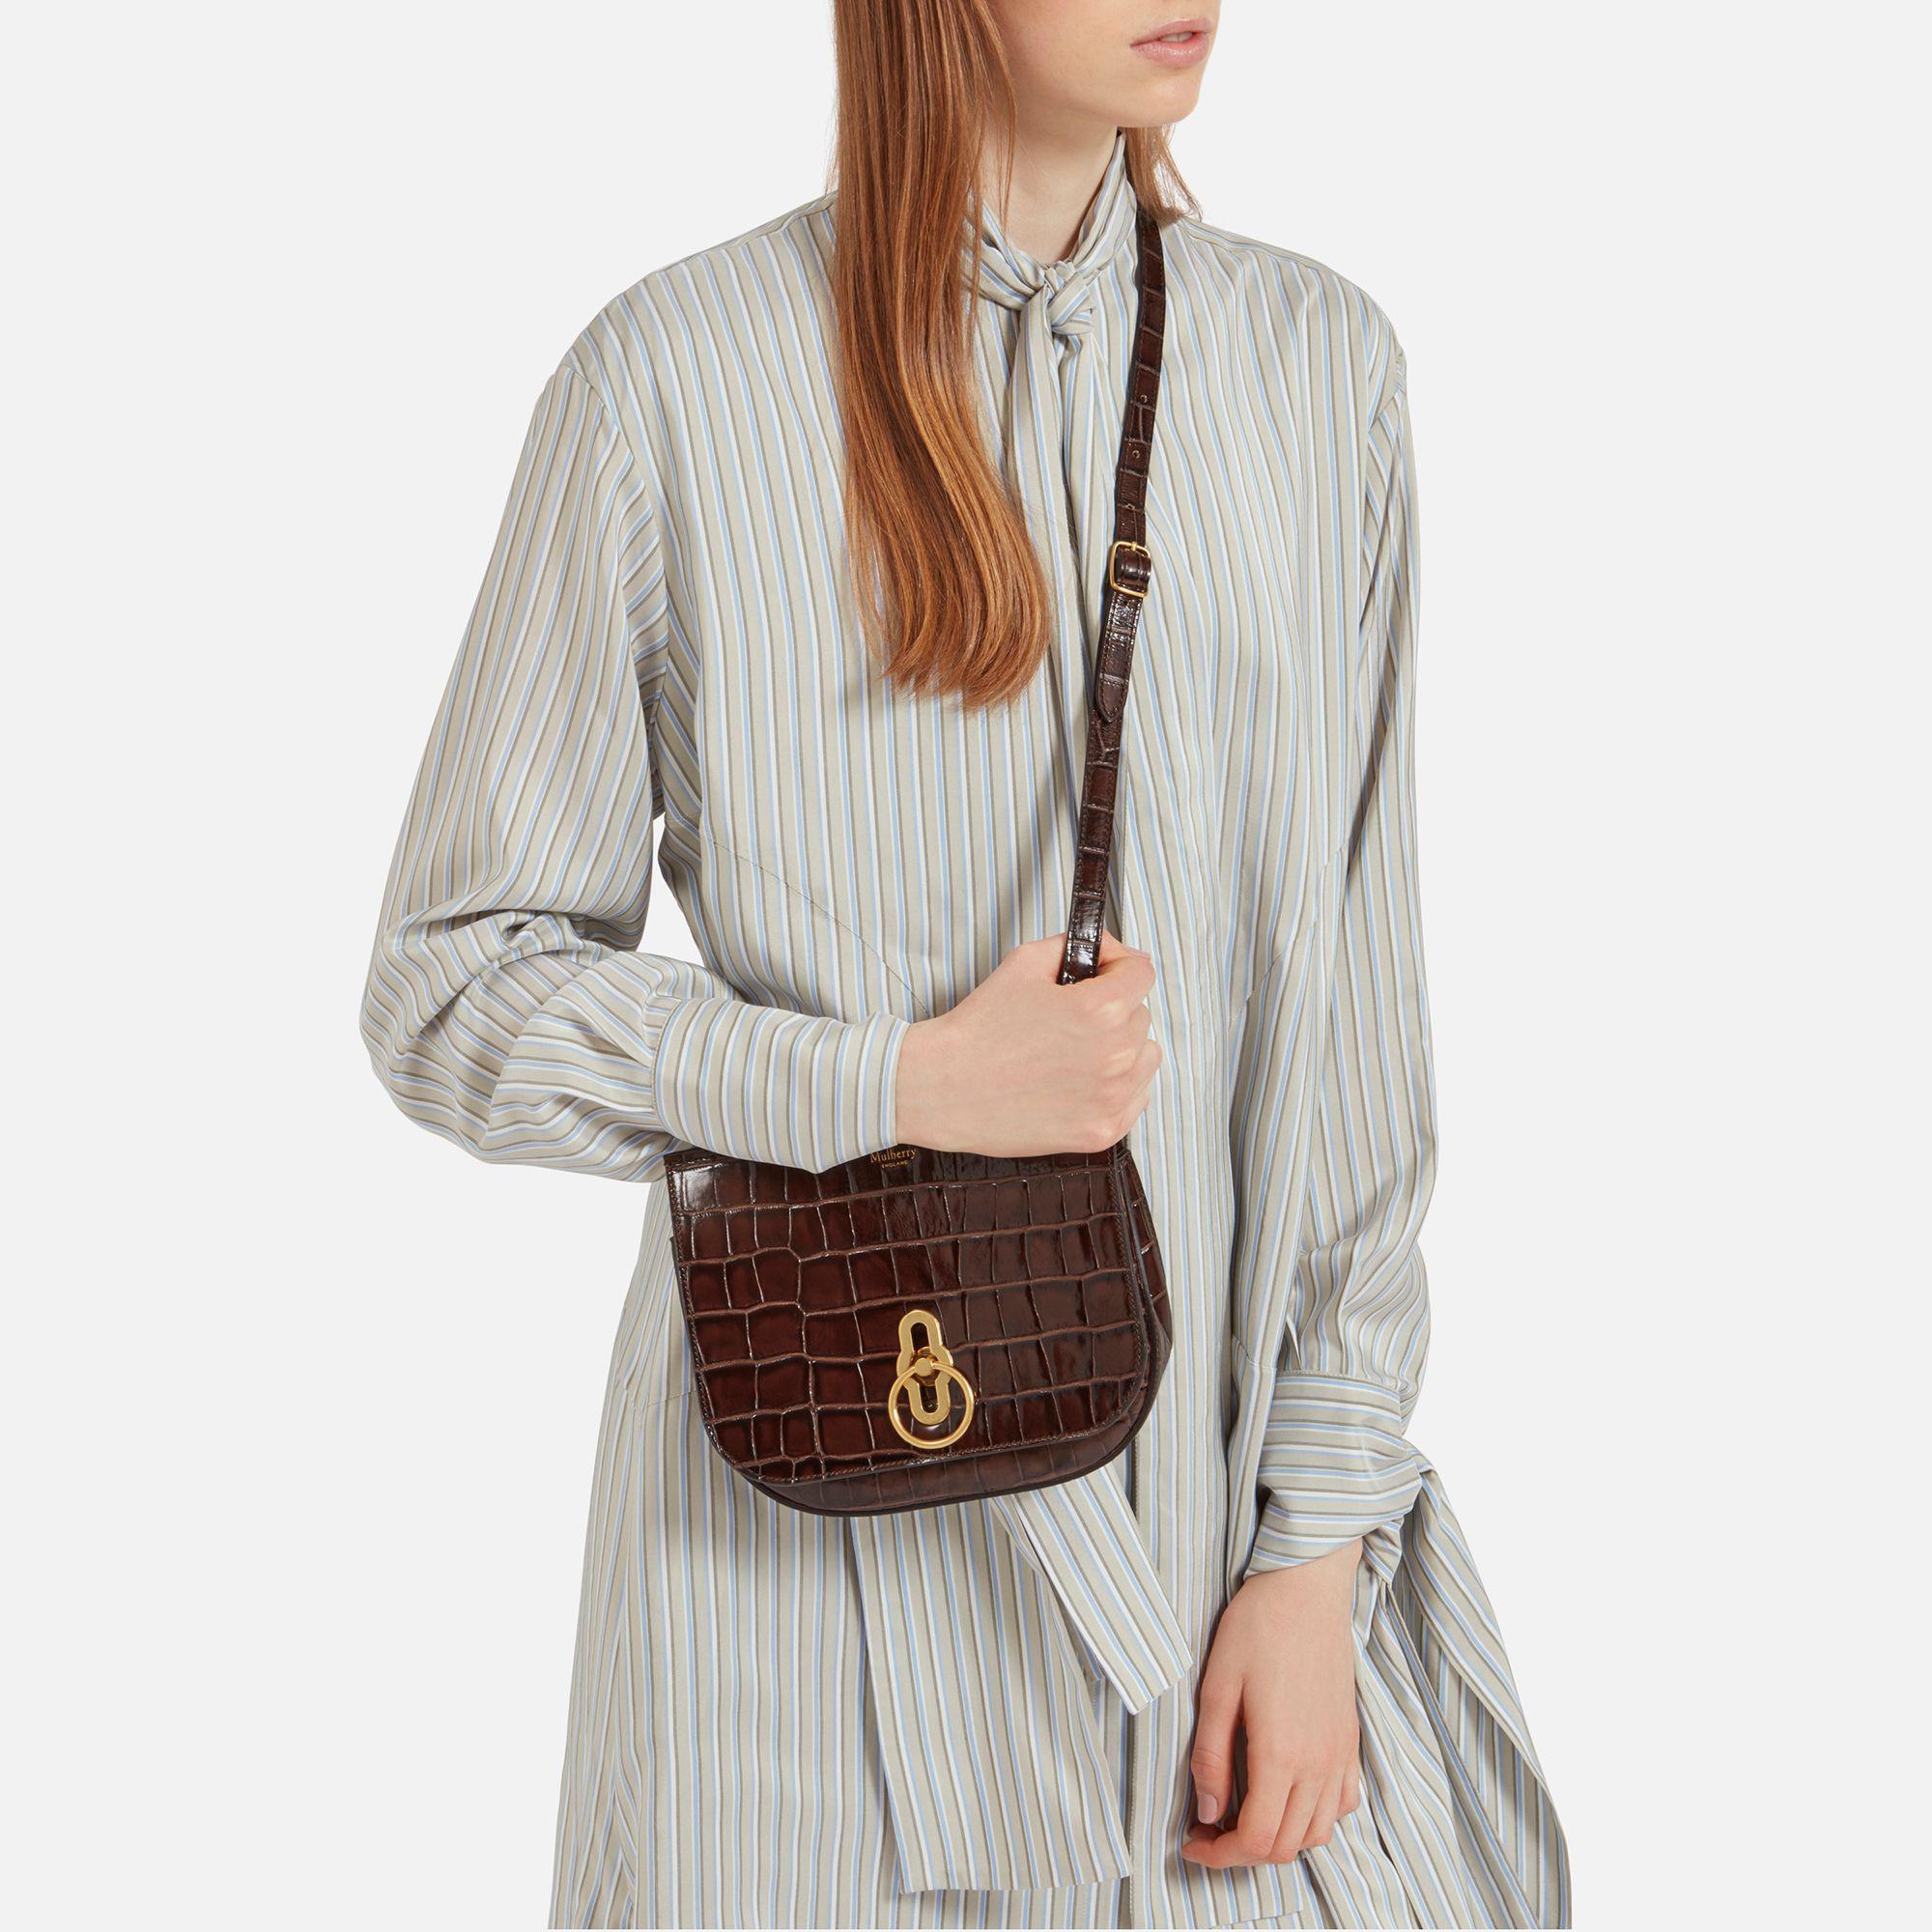 0b4e39d94617 ... new zealand mulberry amberley satchel bag lyst mulberry small amberley  satchel in brown b891c ab2a1